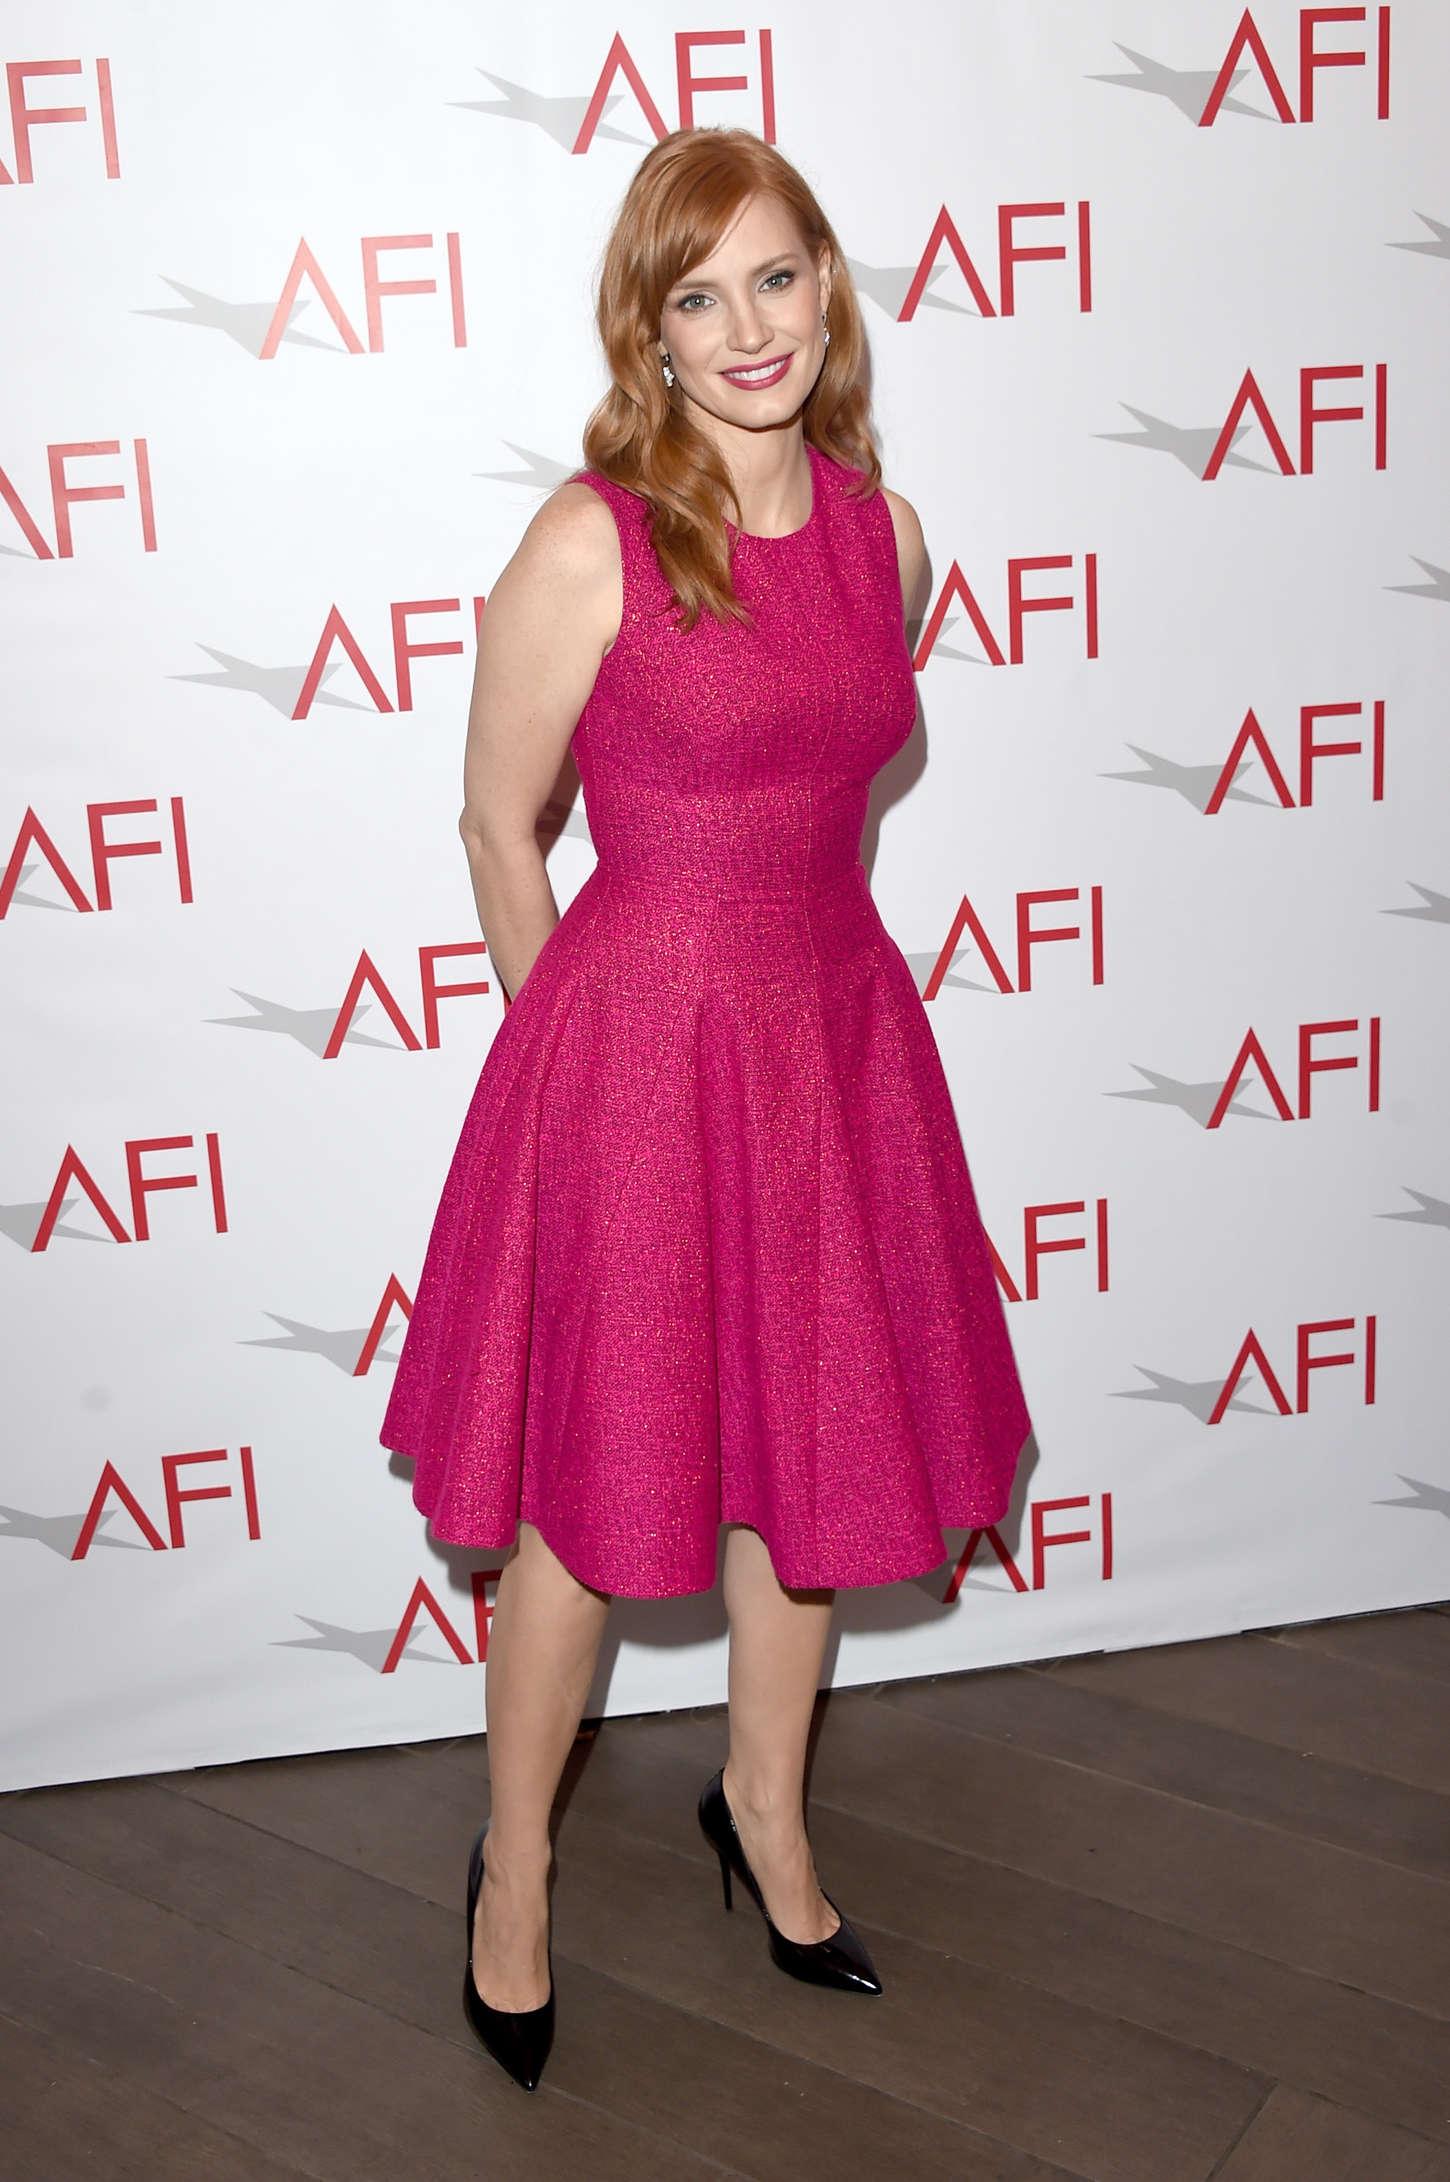 Jessica Chastain 2015 : Jessica Chastain: 2015 AFI Awards -04